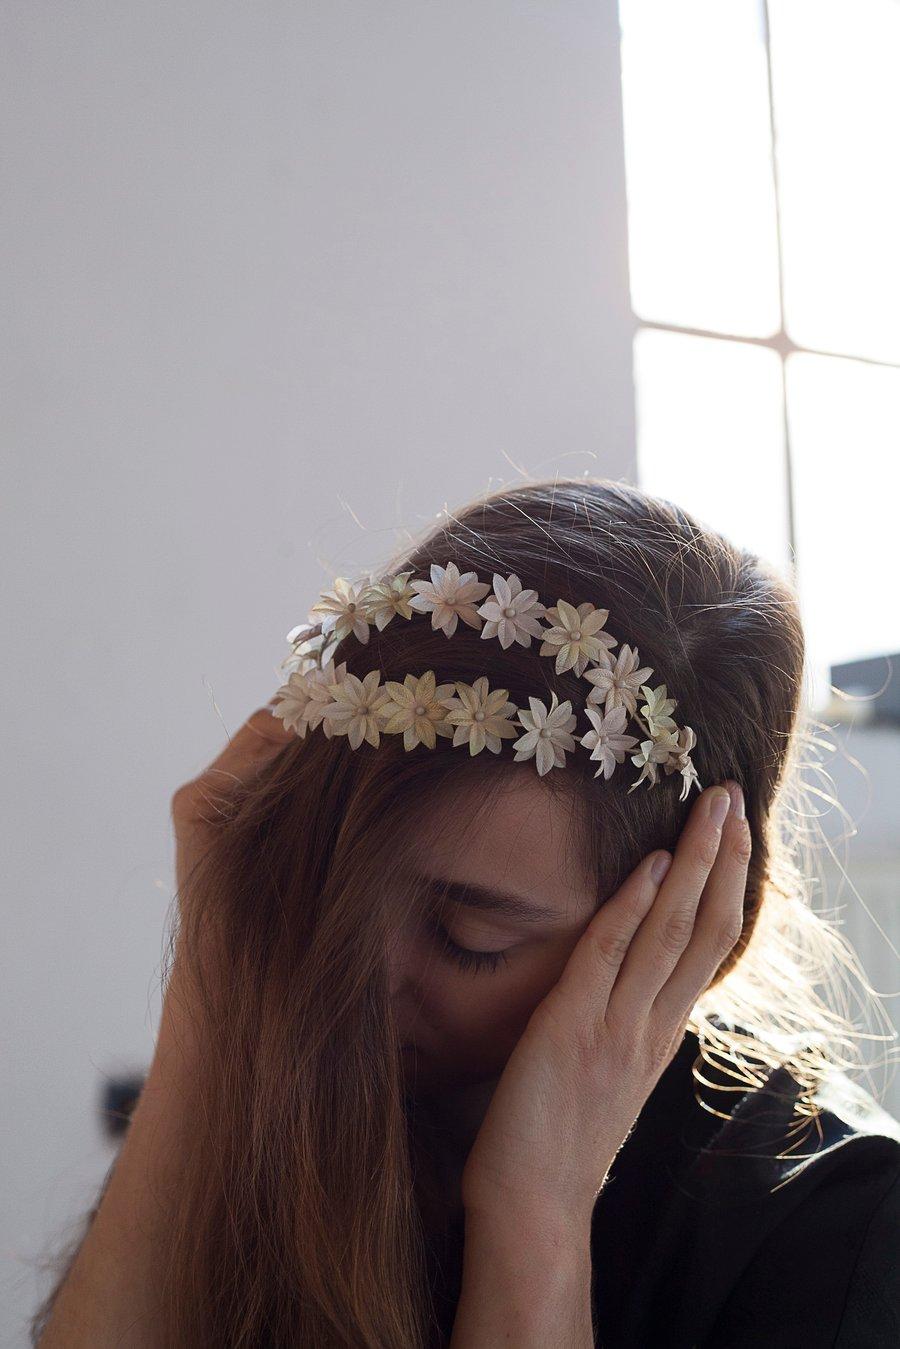 Image of Elipse Stella Teinture Artificielle - Stella Hair Tiara Artificial Dye